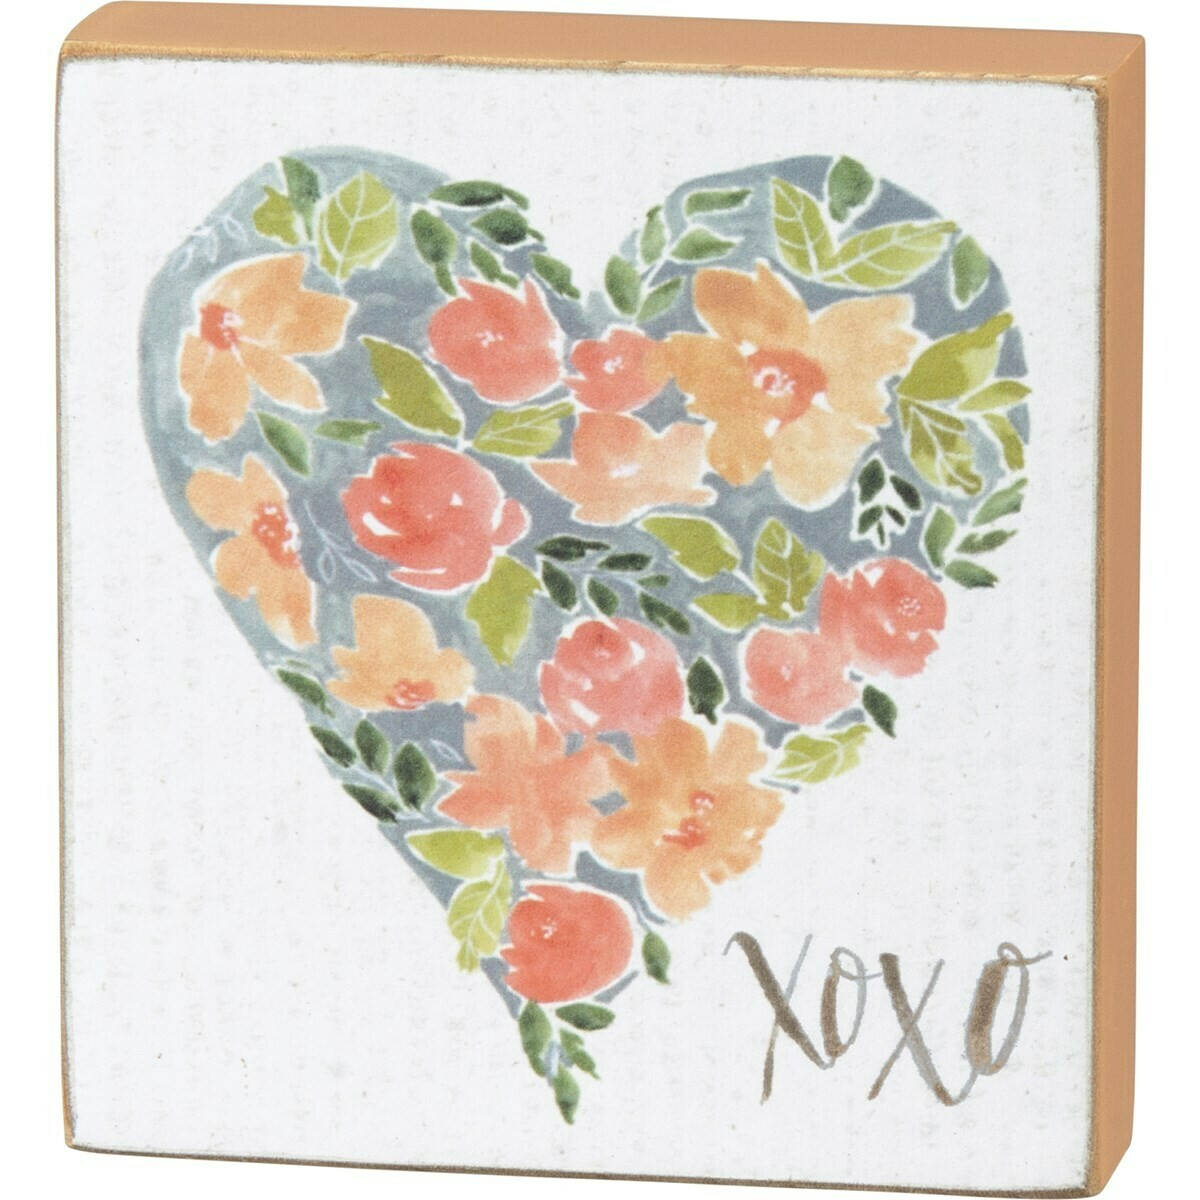 XOXO Heart Block Sign